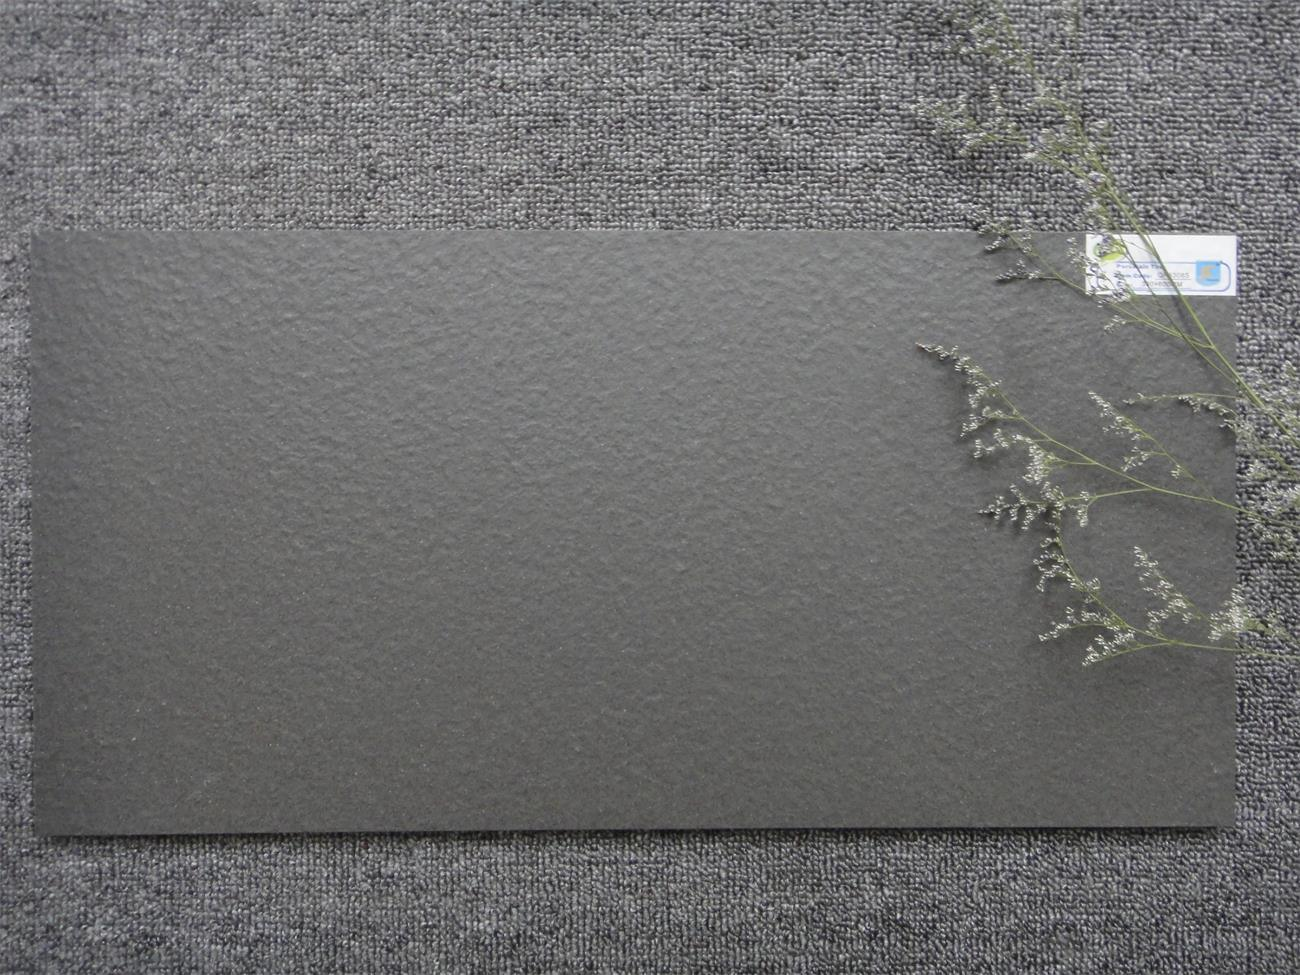 Matt Surface Double Loading Tile